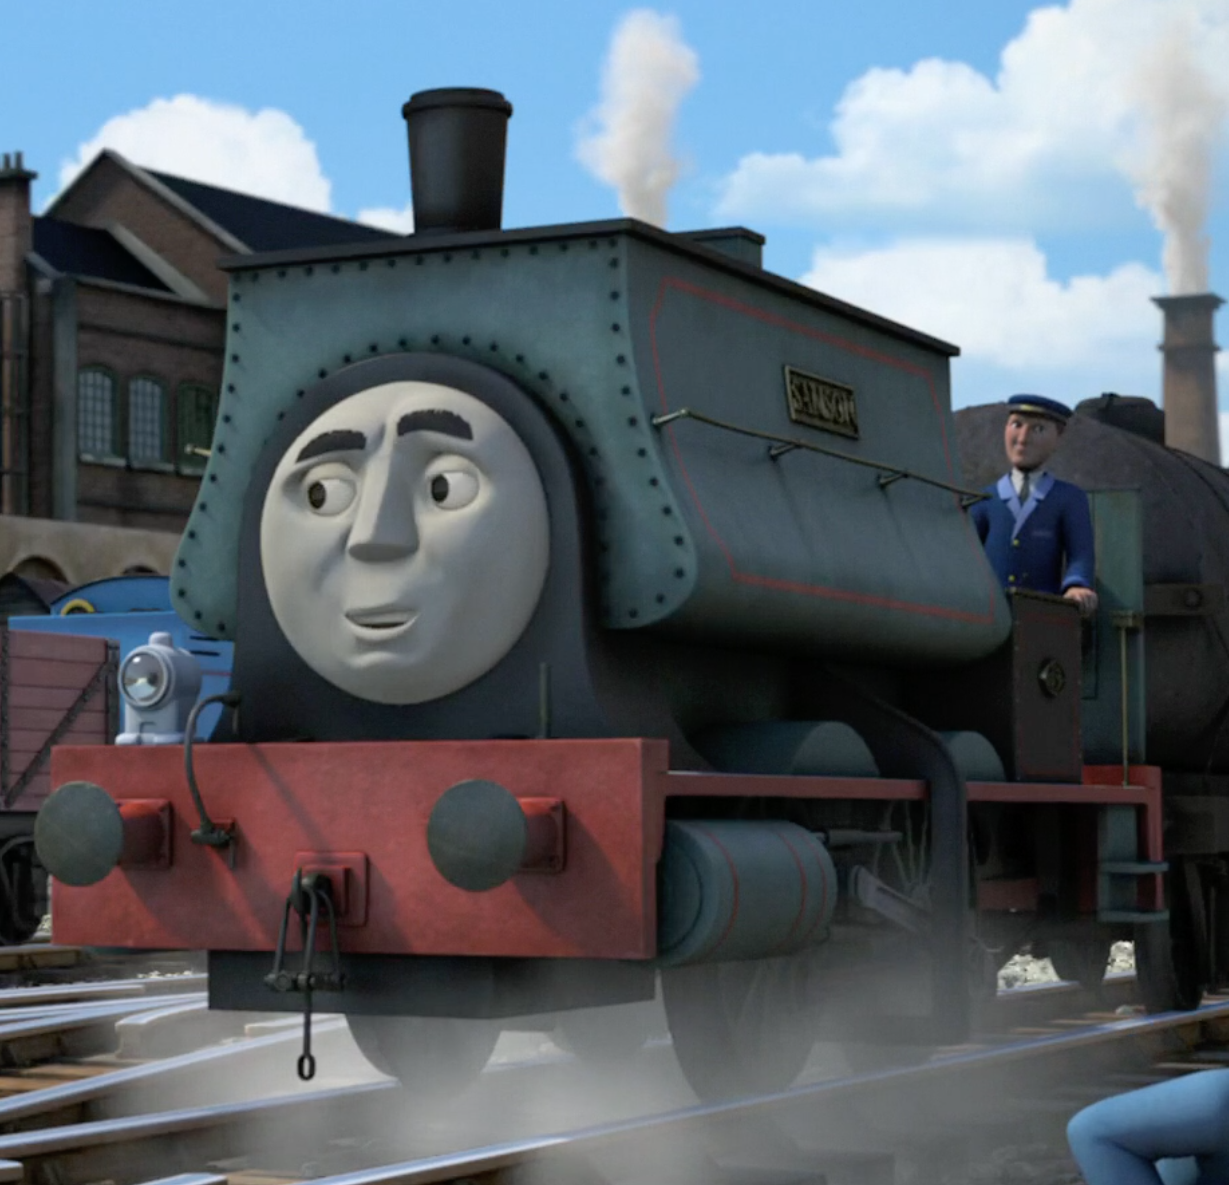 Samson (Thomas and Friends)